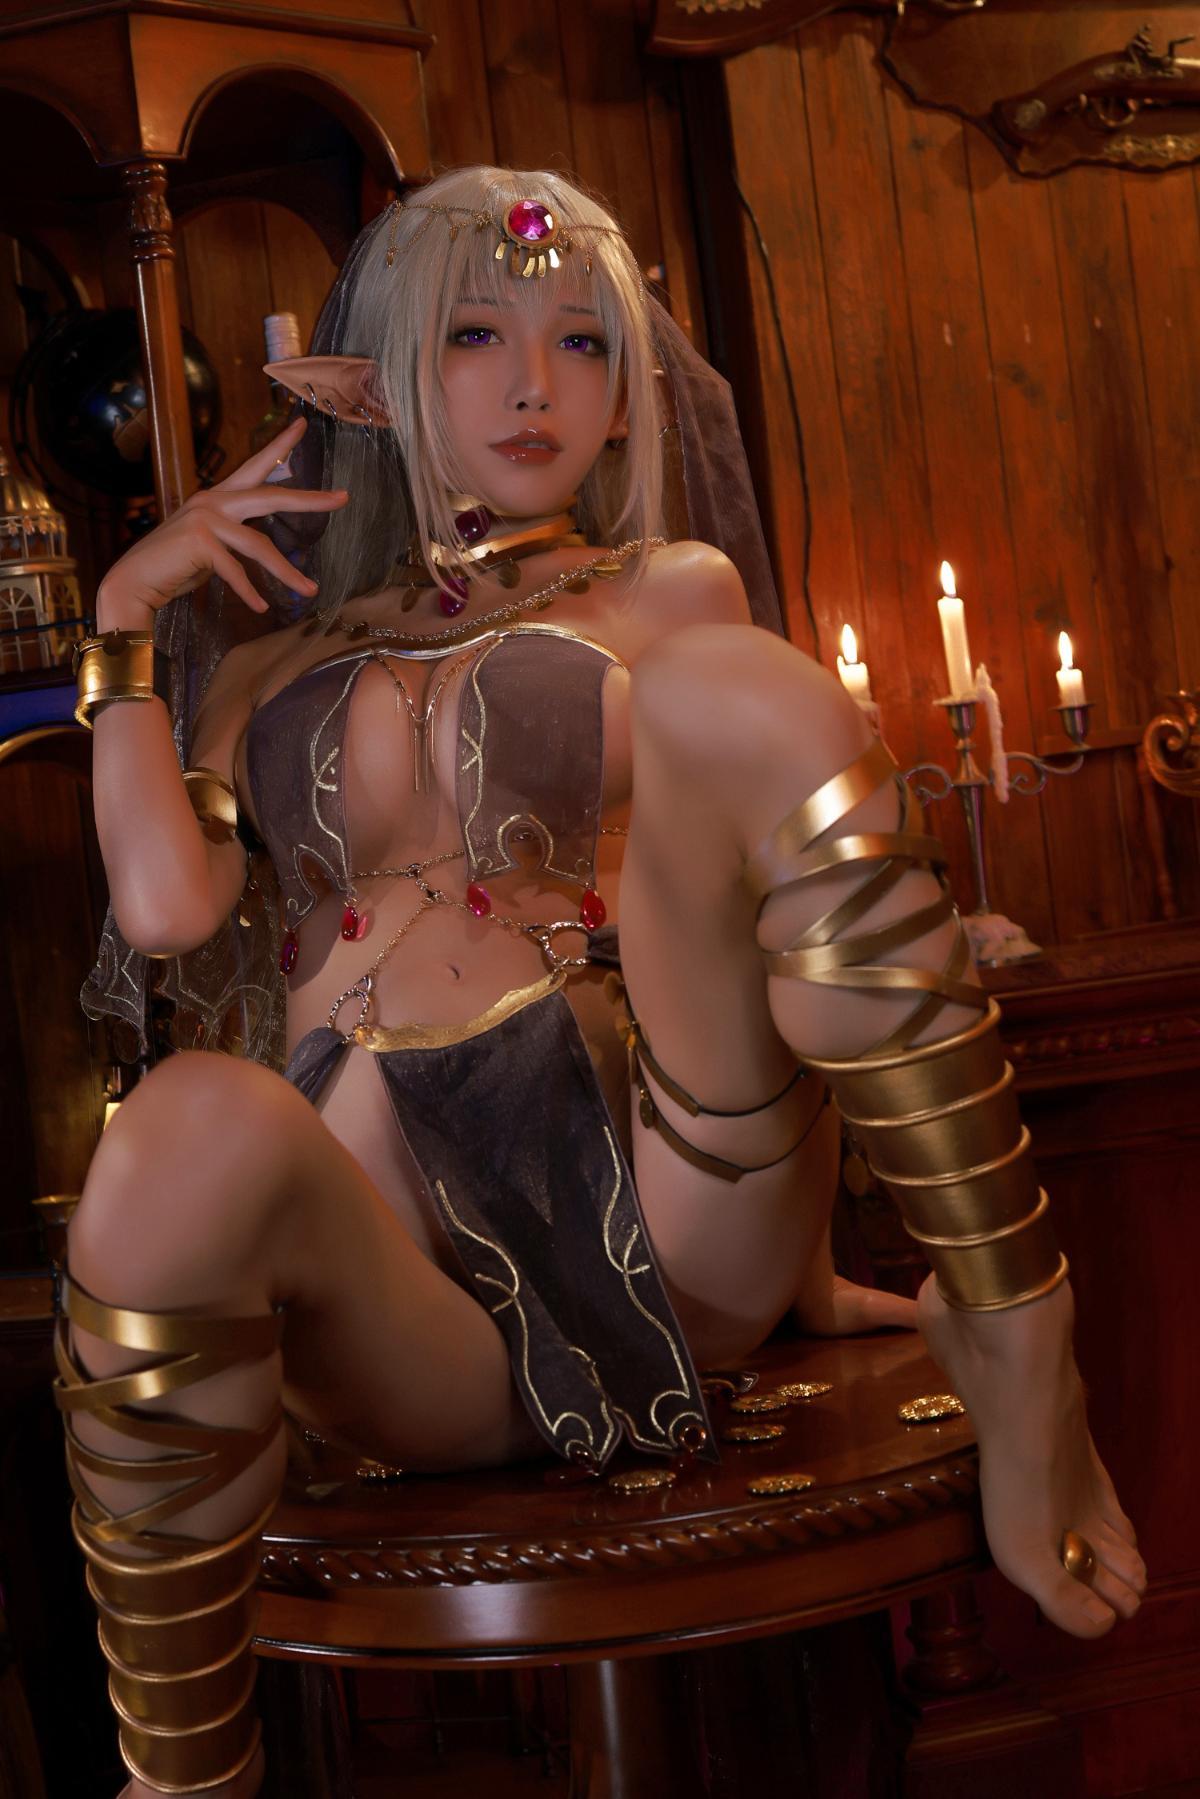 Tan Dancer Elf Succubus Cosplay by Aqua 8